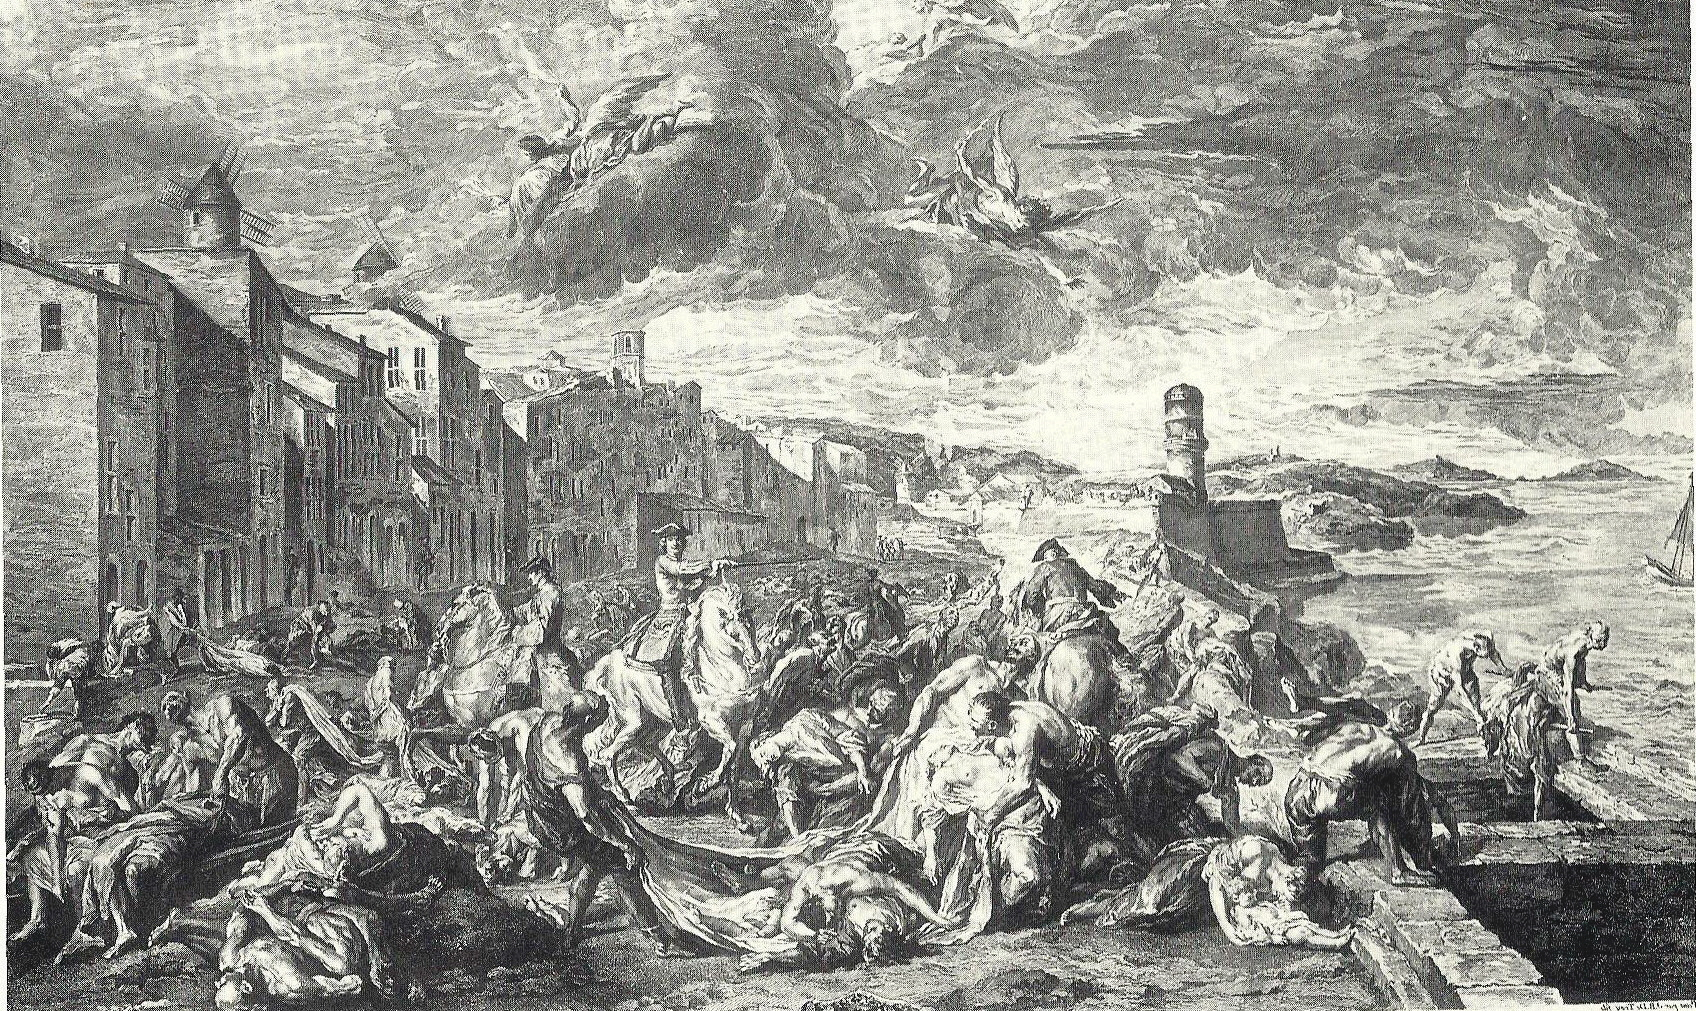 https://fr.wikipedia.org/wiki/Peste_de_Marseille_(1720)#/media/Fichier:Tourette-peste-Roze.jpg